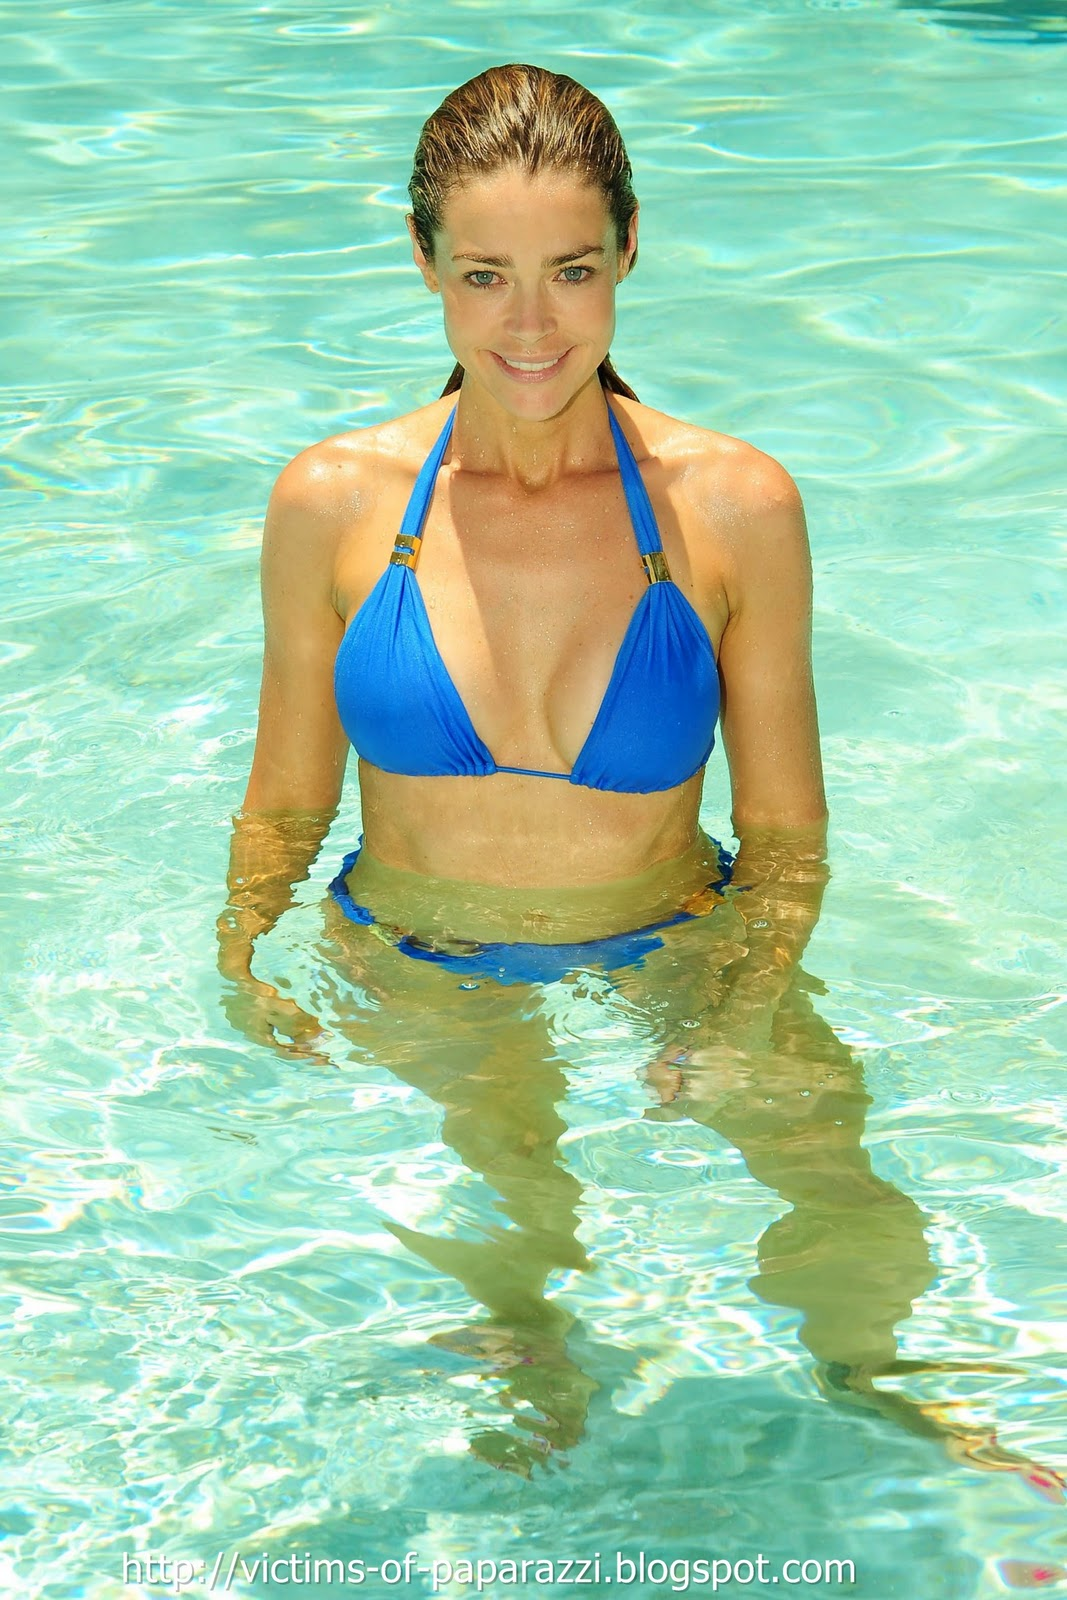 http://4.bp.blogspot.com/_NFcDSk31Yq8/TM_dN4ChYxI/AAAAAAAAAWE/9RzOybjO3Jo/s1600/Denise+Richards+blue+bikini+5.jpg